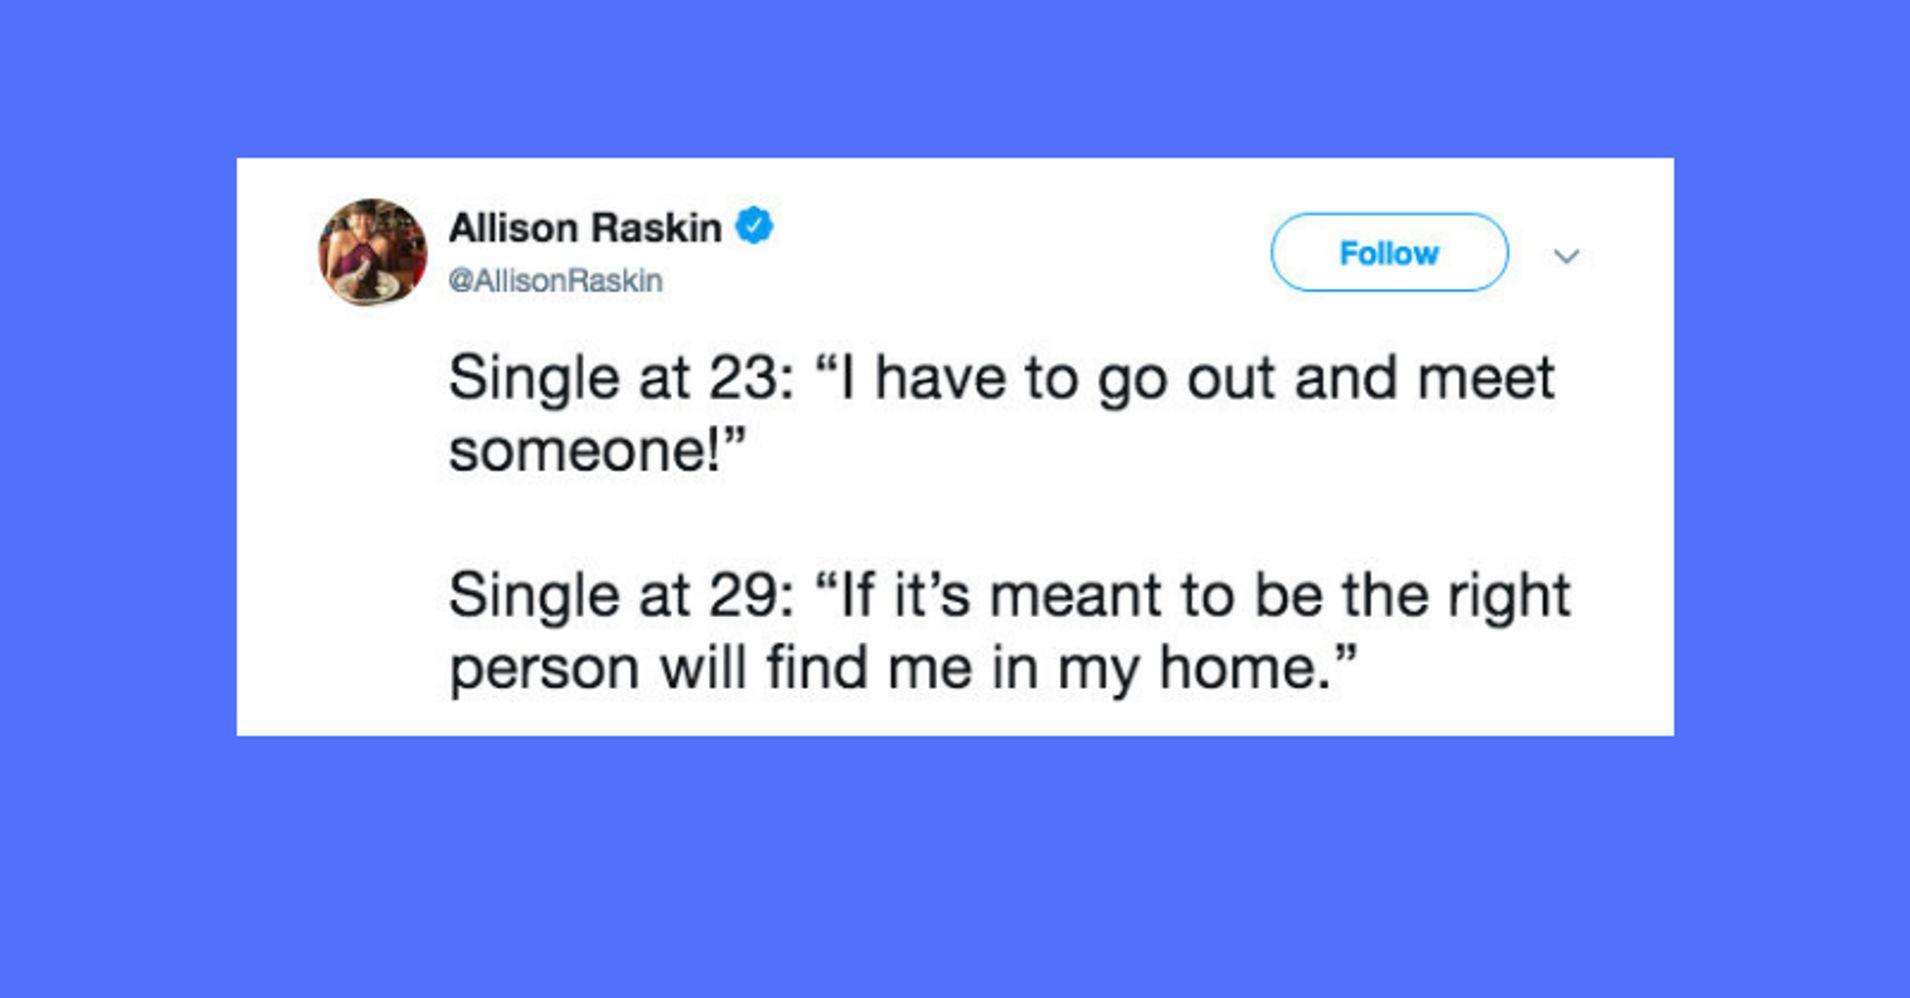 minnesota dating laws minors